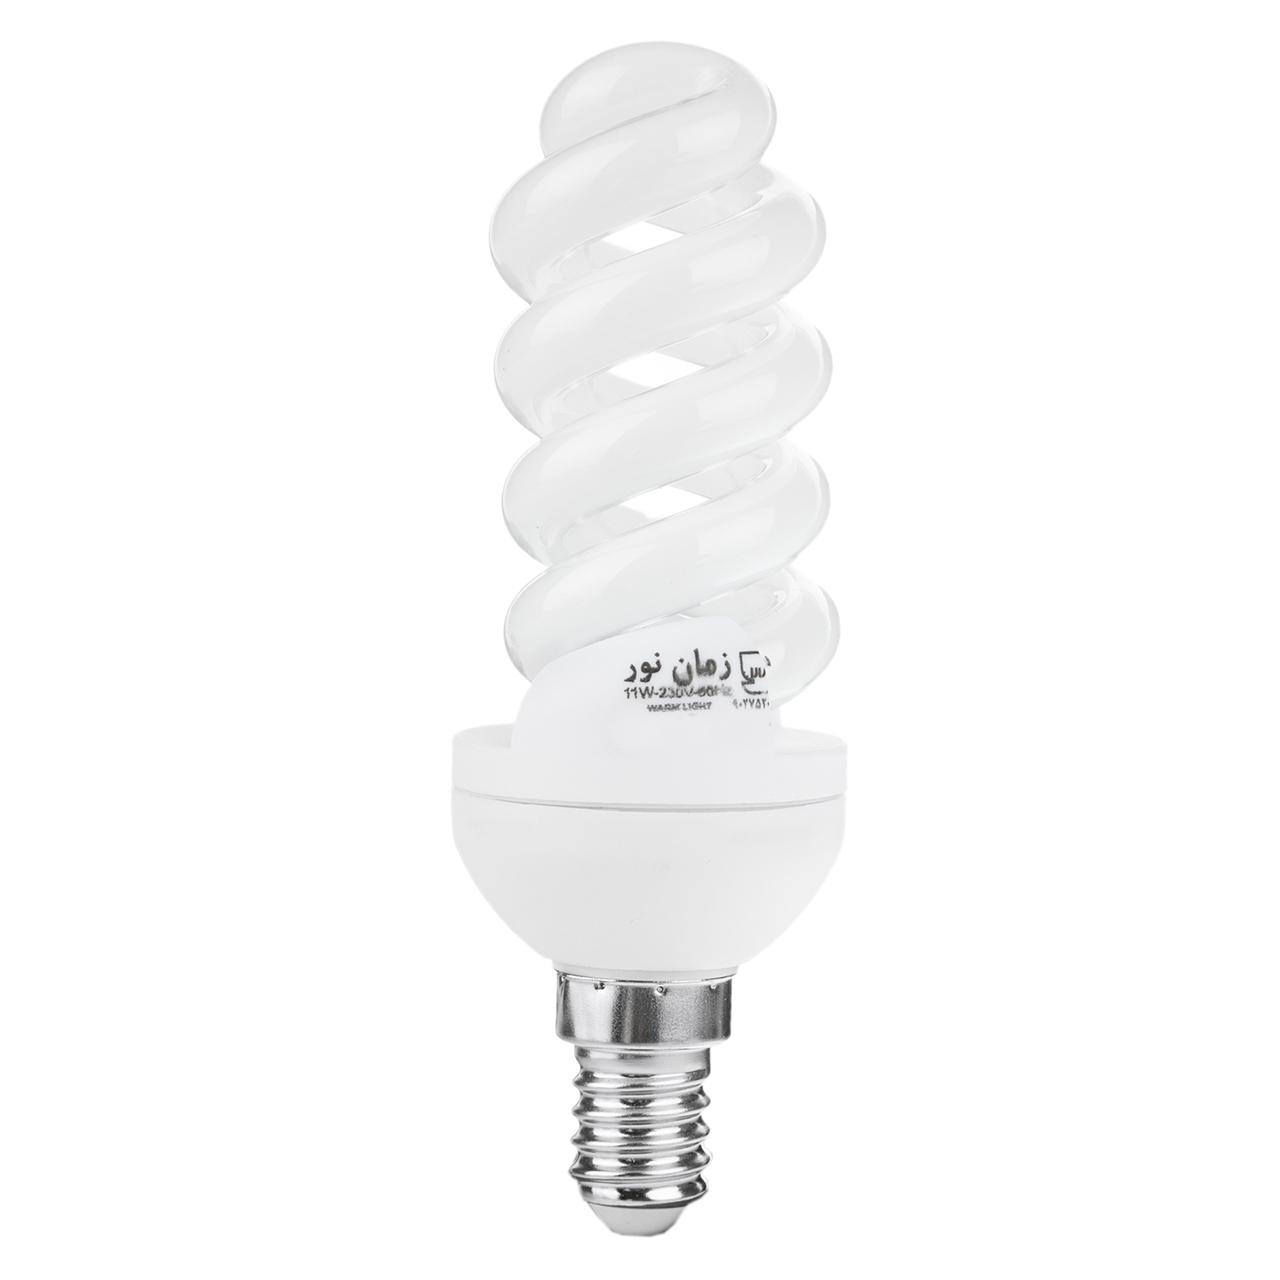 لامپ کم مصرف 11 وات زمان نور مدل Spiral پایه E14